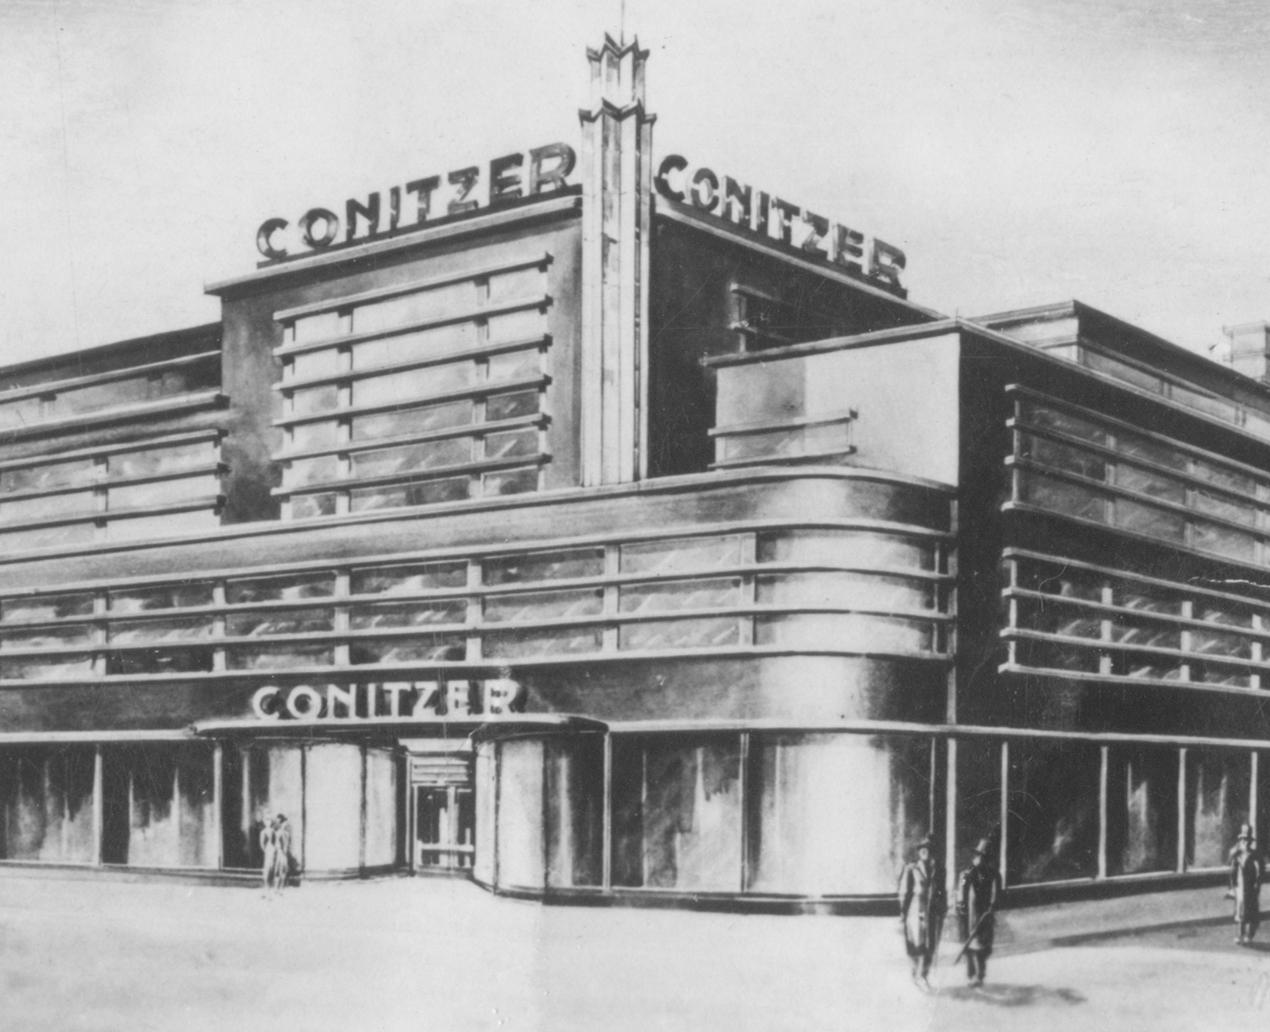 Bauhaus entdecken - Conitzer-Kaufhaus 1928-29_Archiv Klaus Blechschmidt